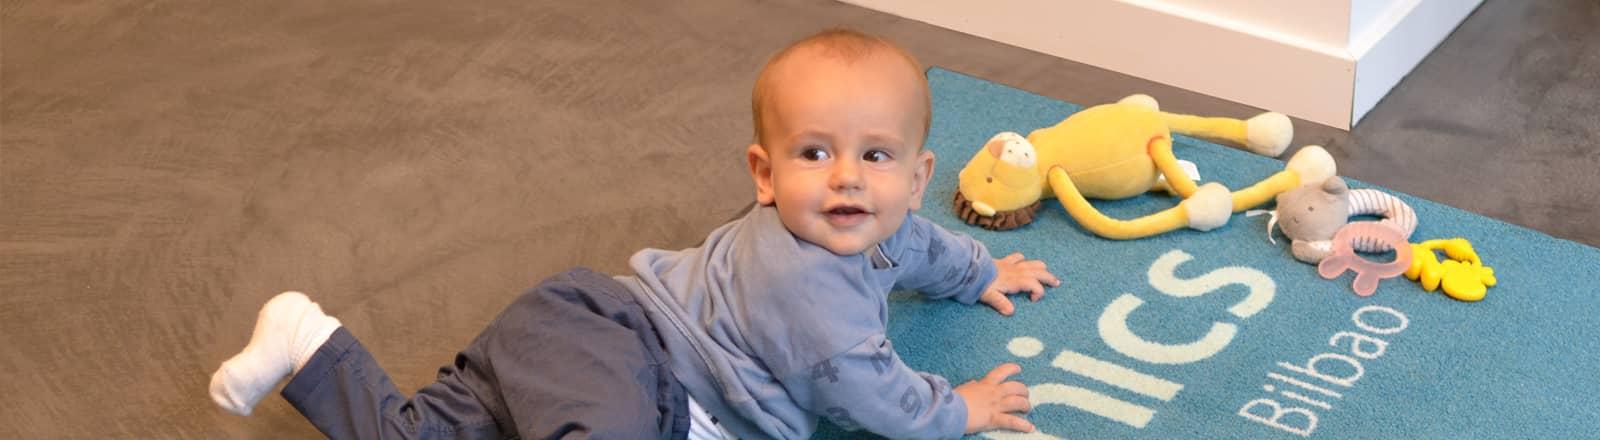 osteopatia infantil Logroño